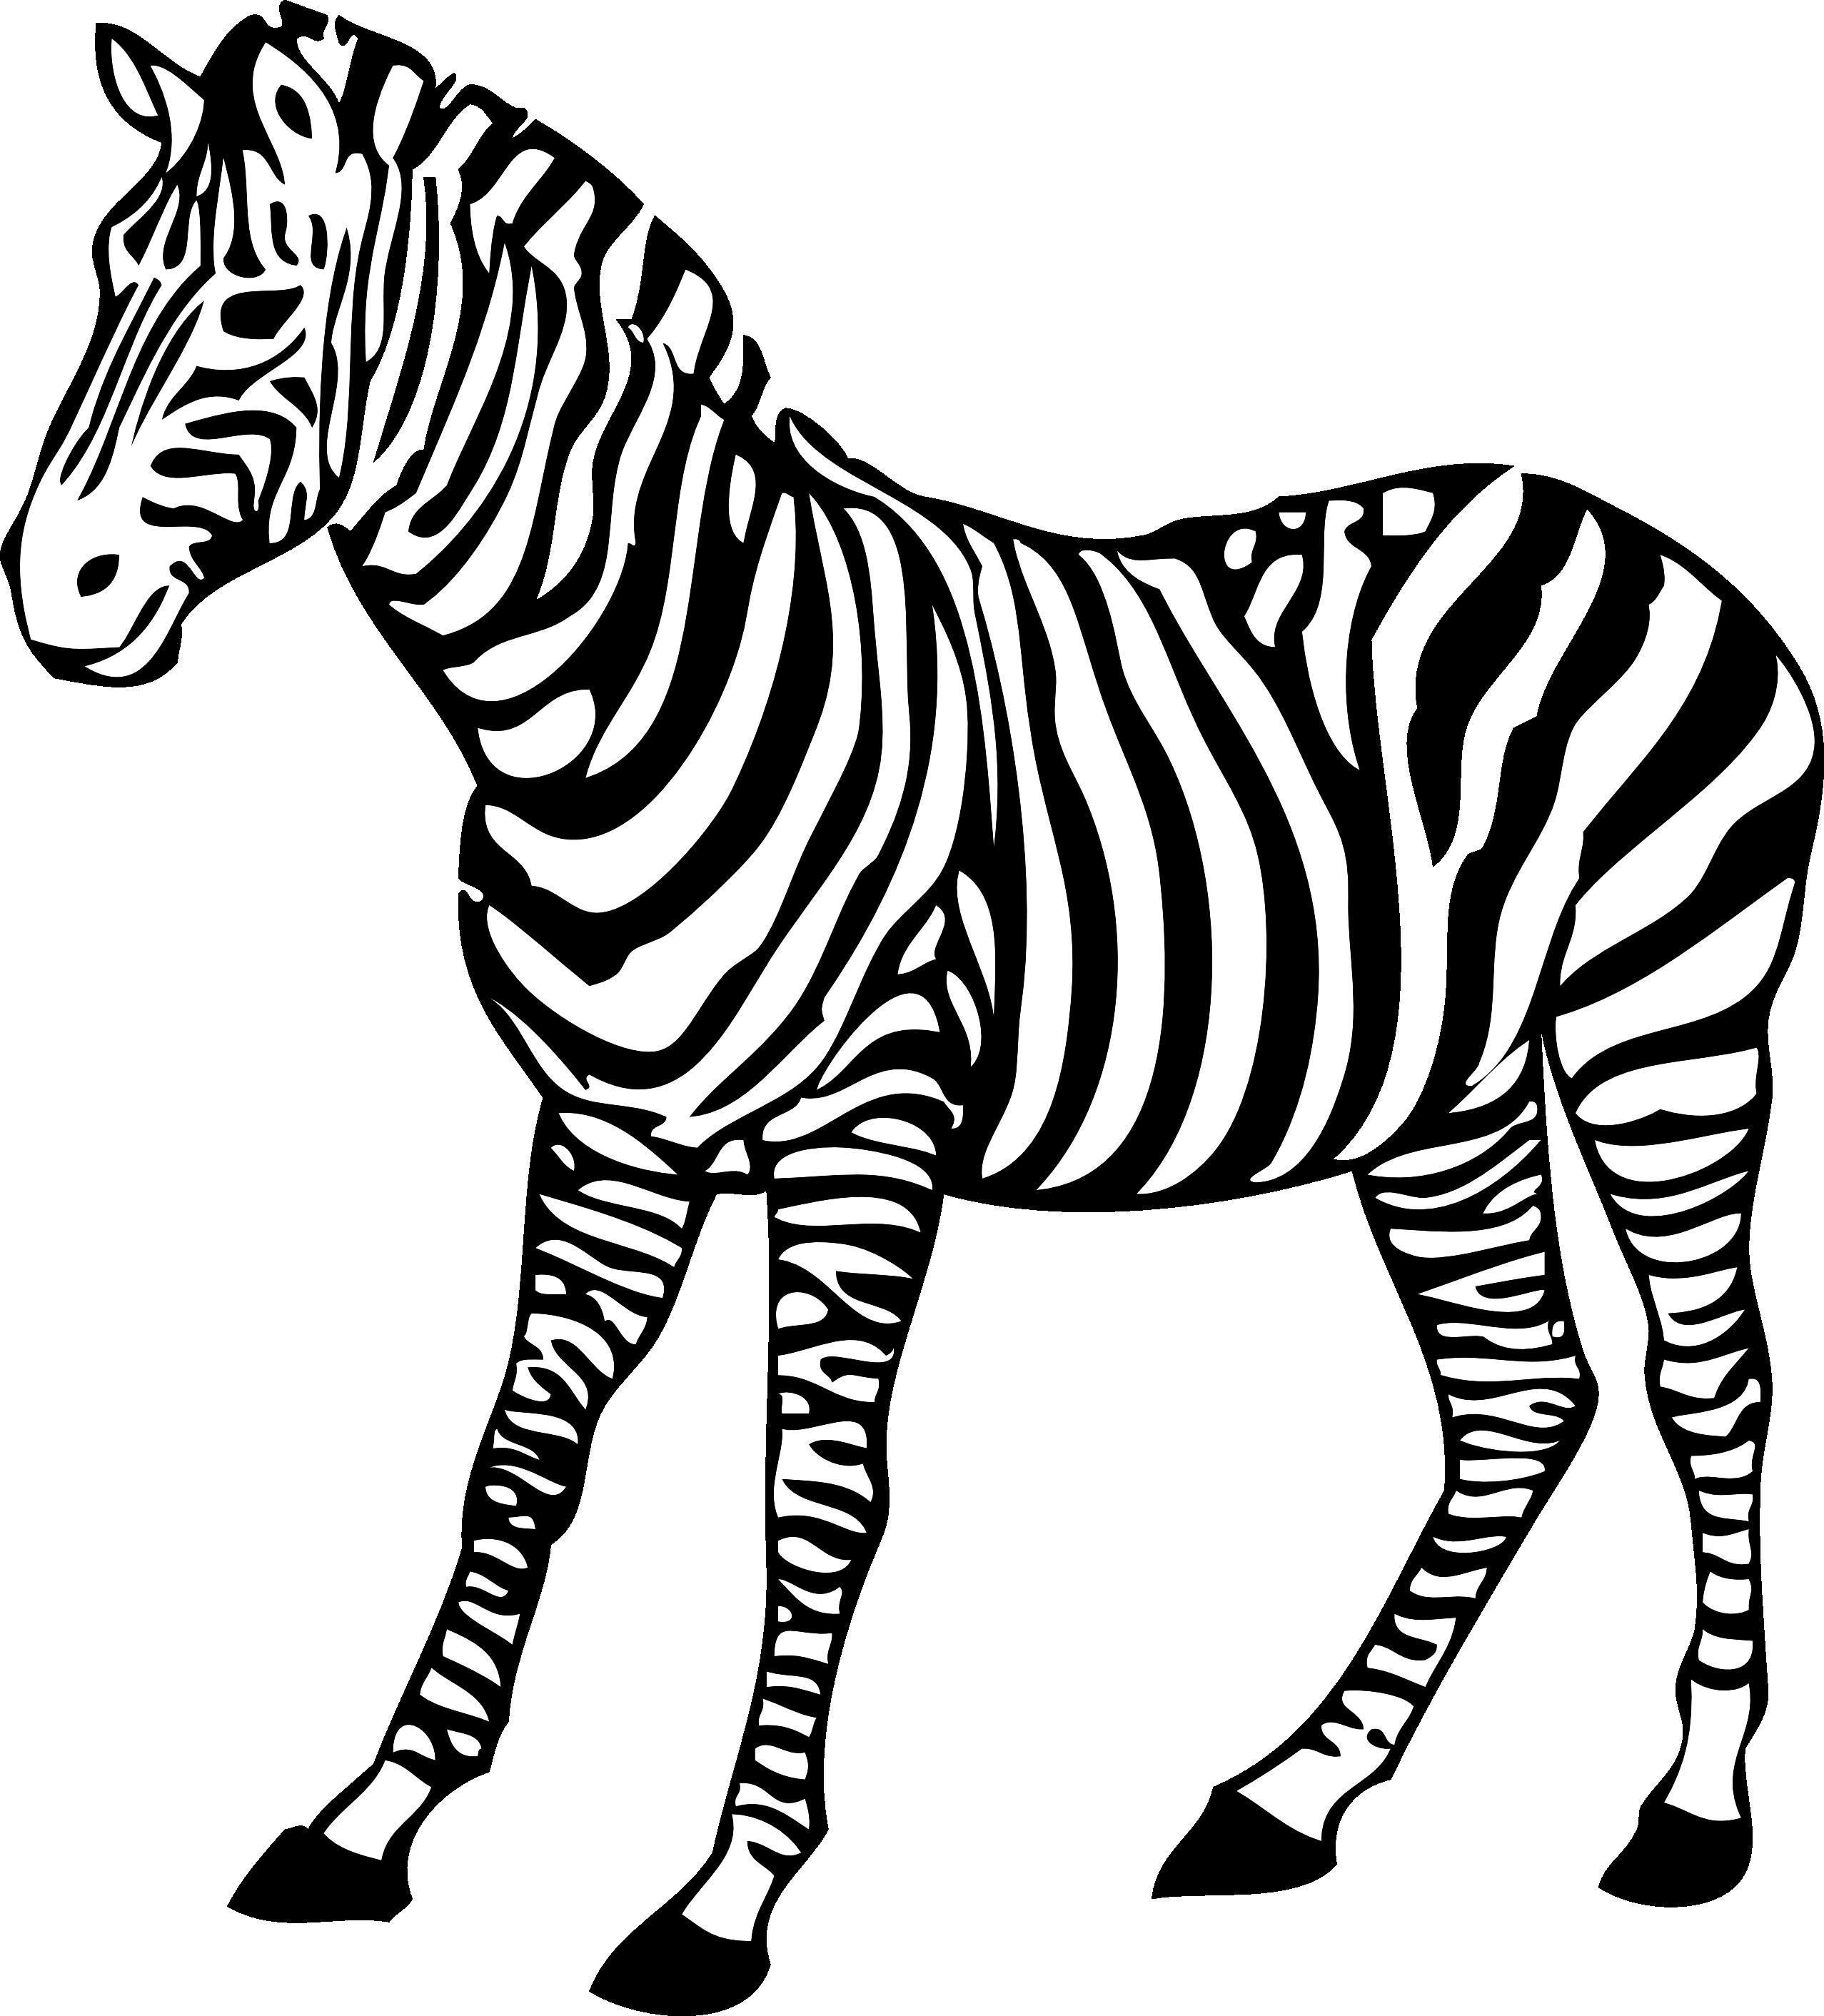 Xylophone clipart cartoon. Zebra black white line